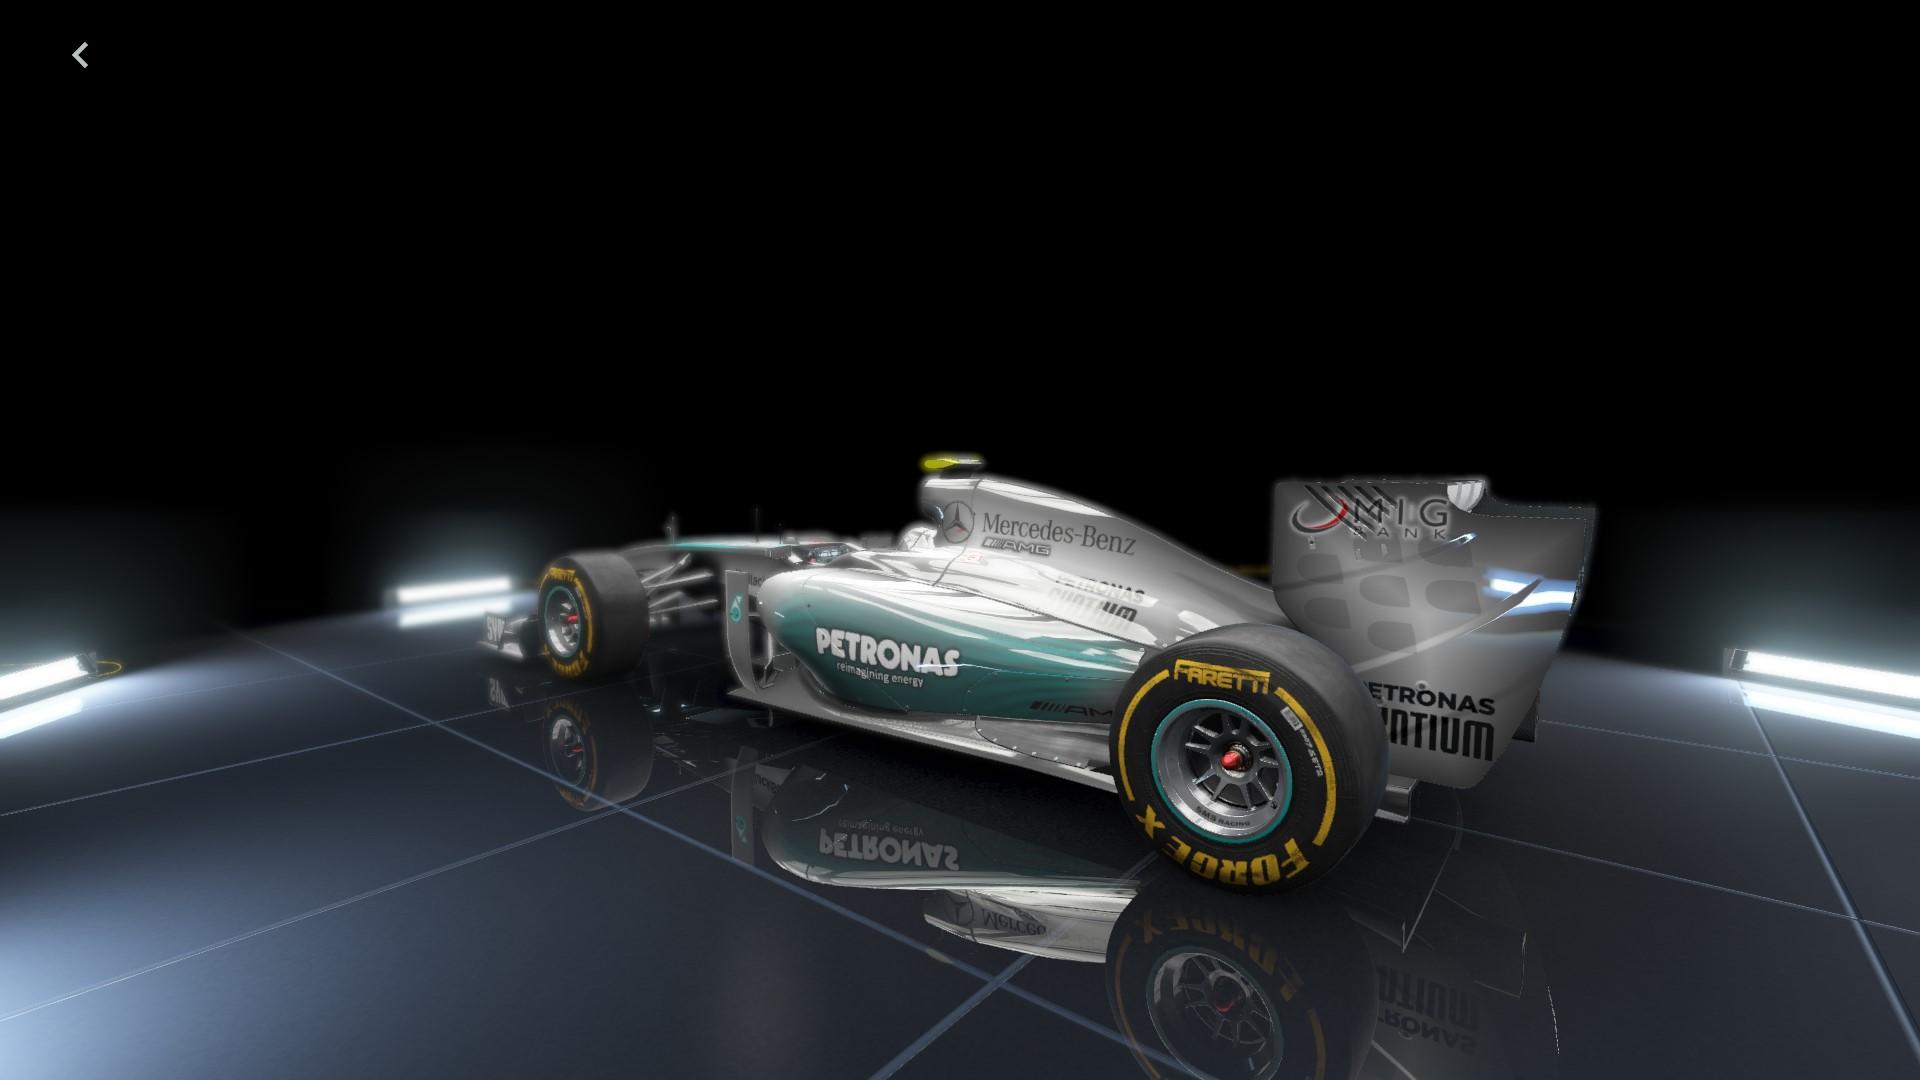 Formula a f1 mercedes benz petronas team racedepartment for Mercedes benz petronas